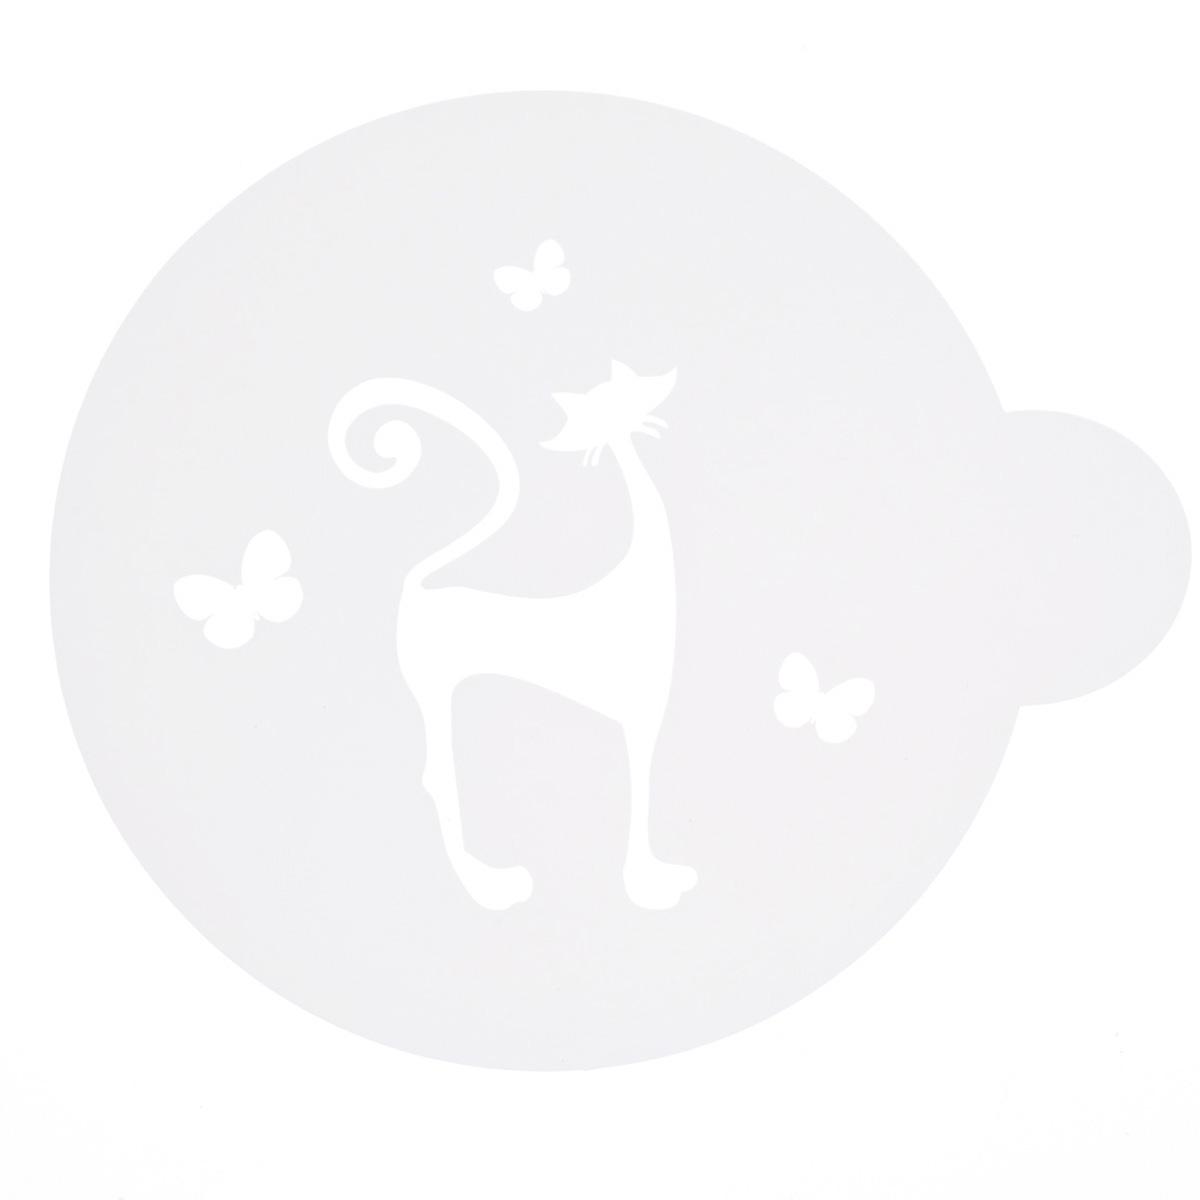 Трафарет на кофе и десерты Леденцовая фабрика Кошечка и бабочки, диаметр 10 см трафарет на кофе и десерты леденцовая фабрика кошка с рыбой диаметр 10 см